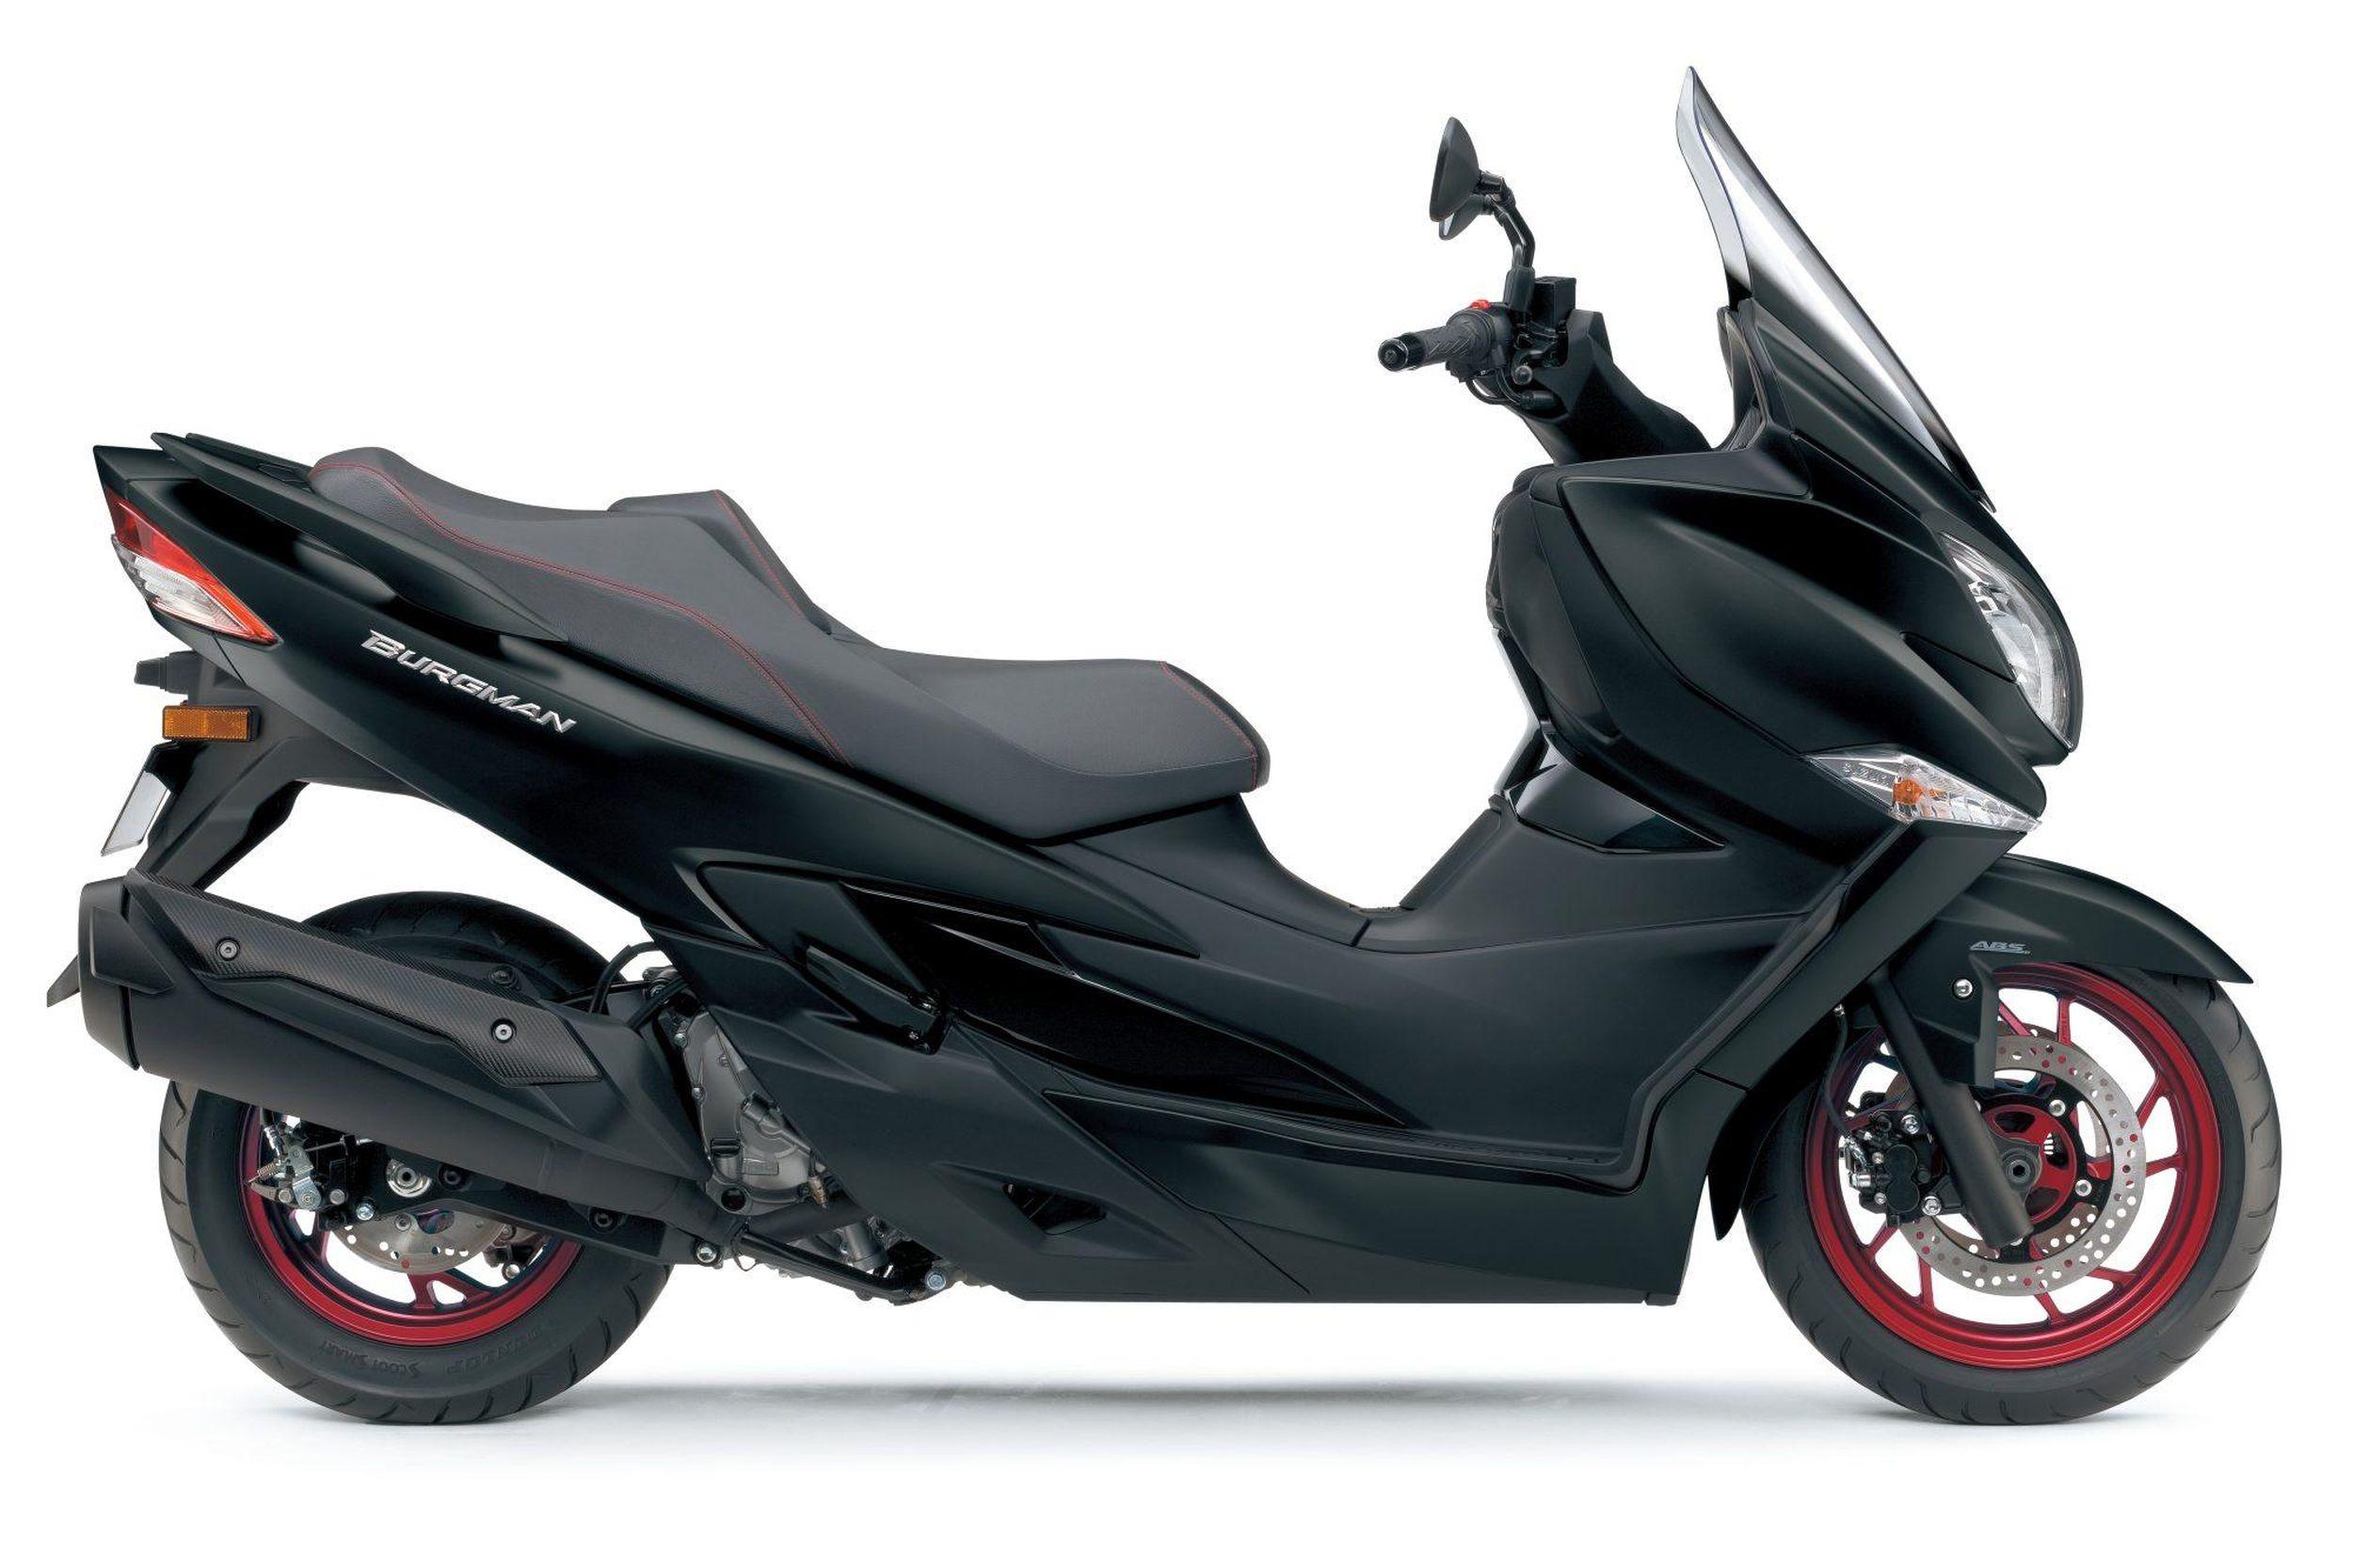 Suzuki Burgman Abs Price